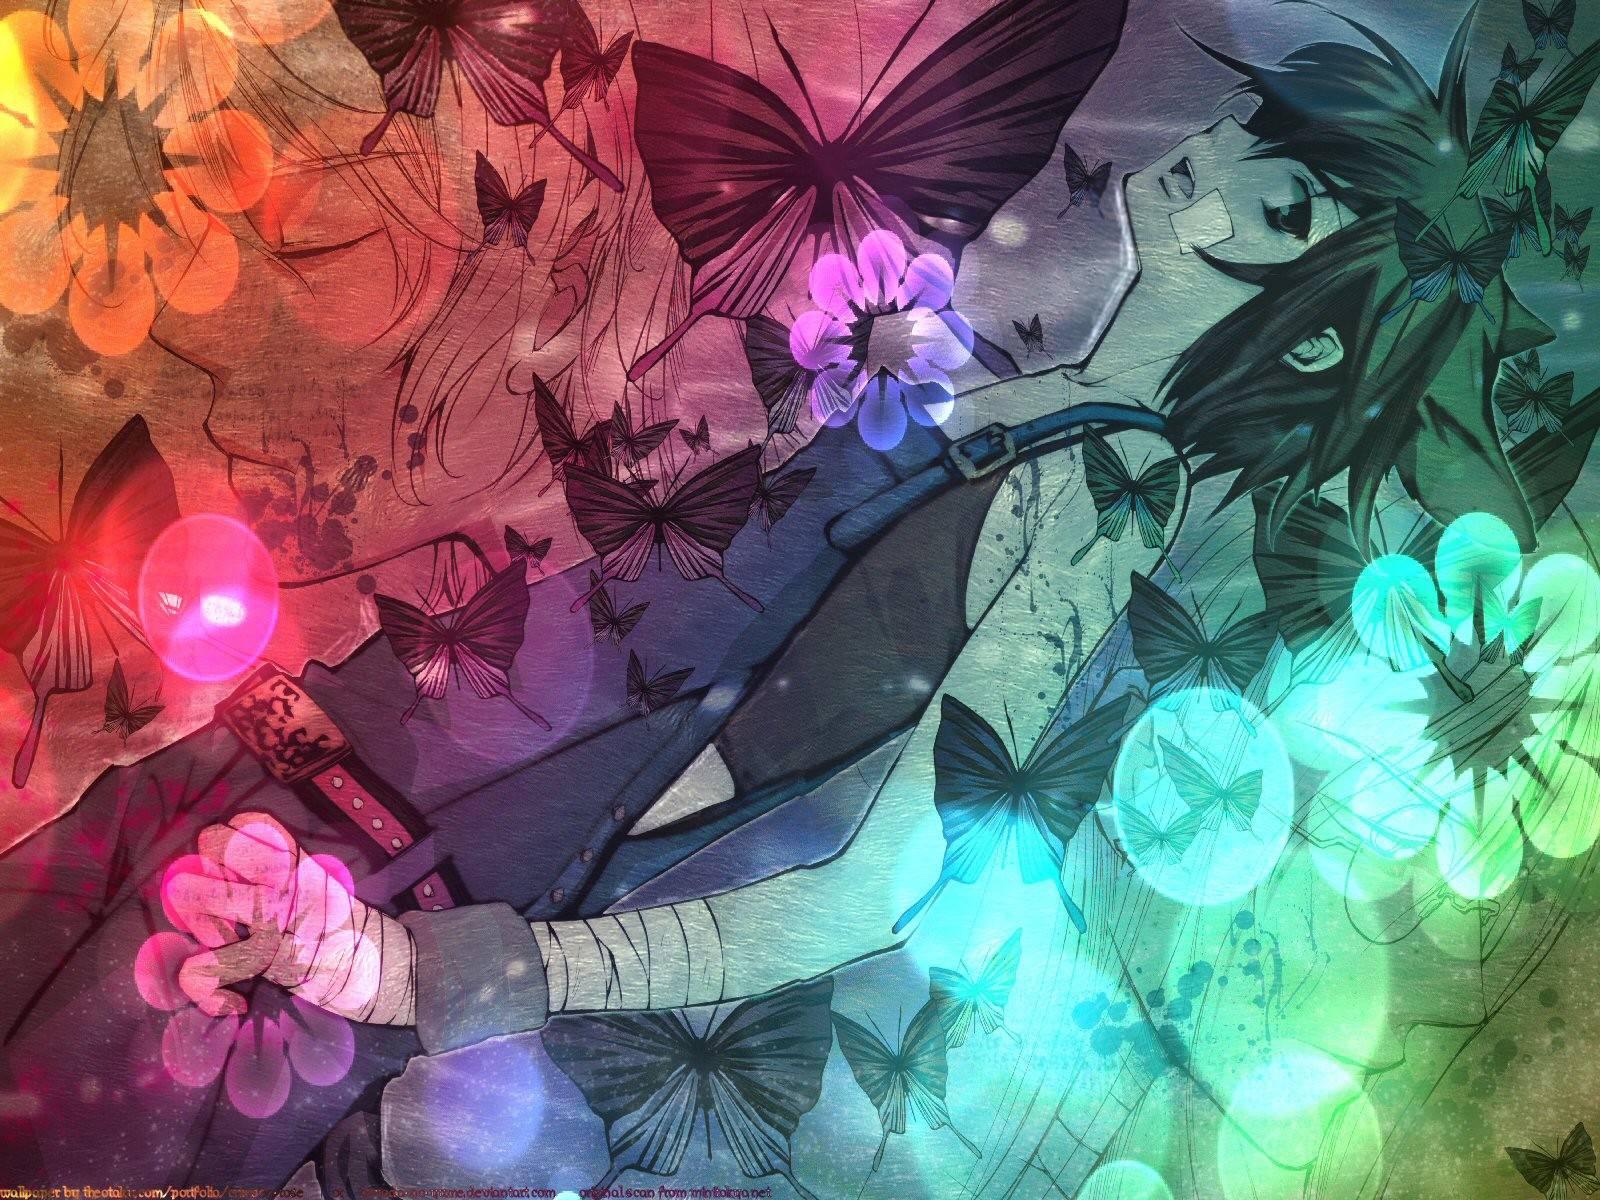 http://4.bp.blogspot.com/-3ukSpS4T_9A/UO32G2Z8I3I/AAAAAAAANCw/TCEDTYdoXHo/s1600/rainbow-flowers-brothers-nekomimi-loveless-cat-ears-anime-anime-boy-butterflies-ritsuka-aoyagi-bandages-seimei-aoyagi-wallpaper.jpg